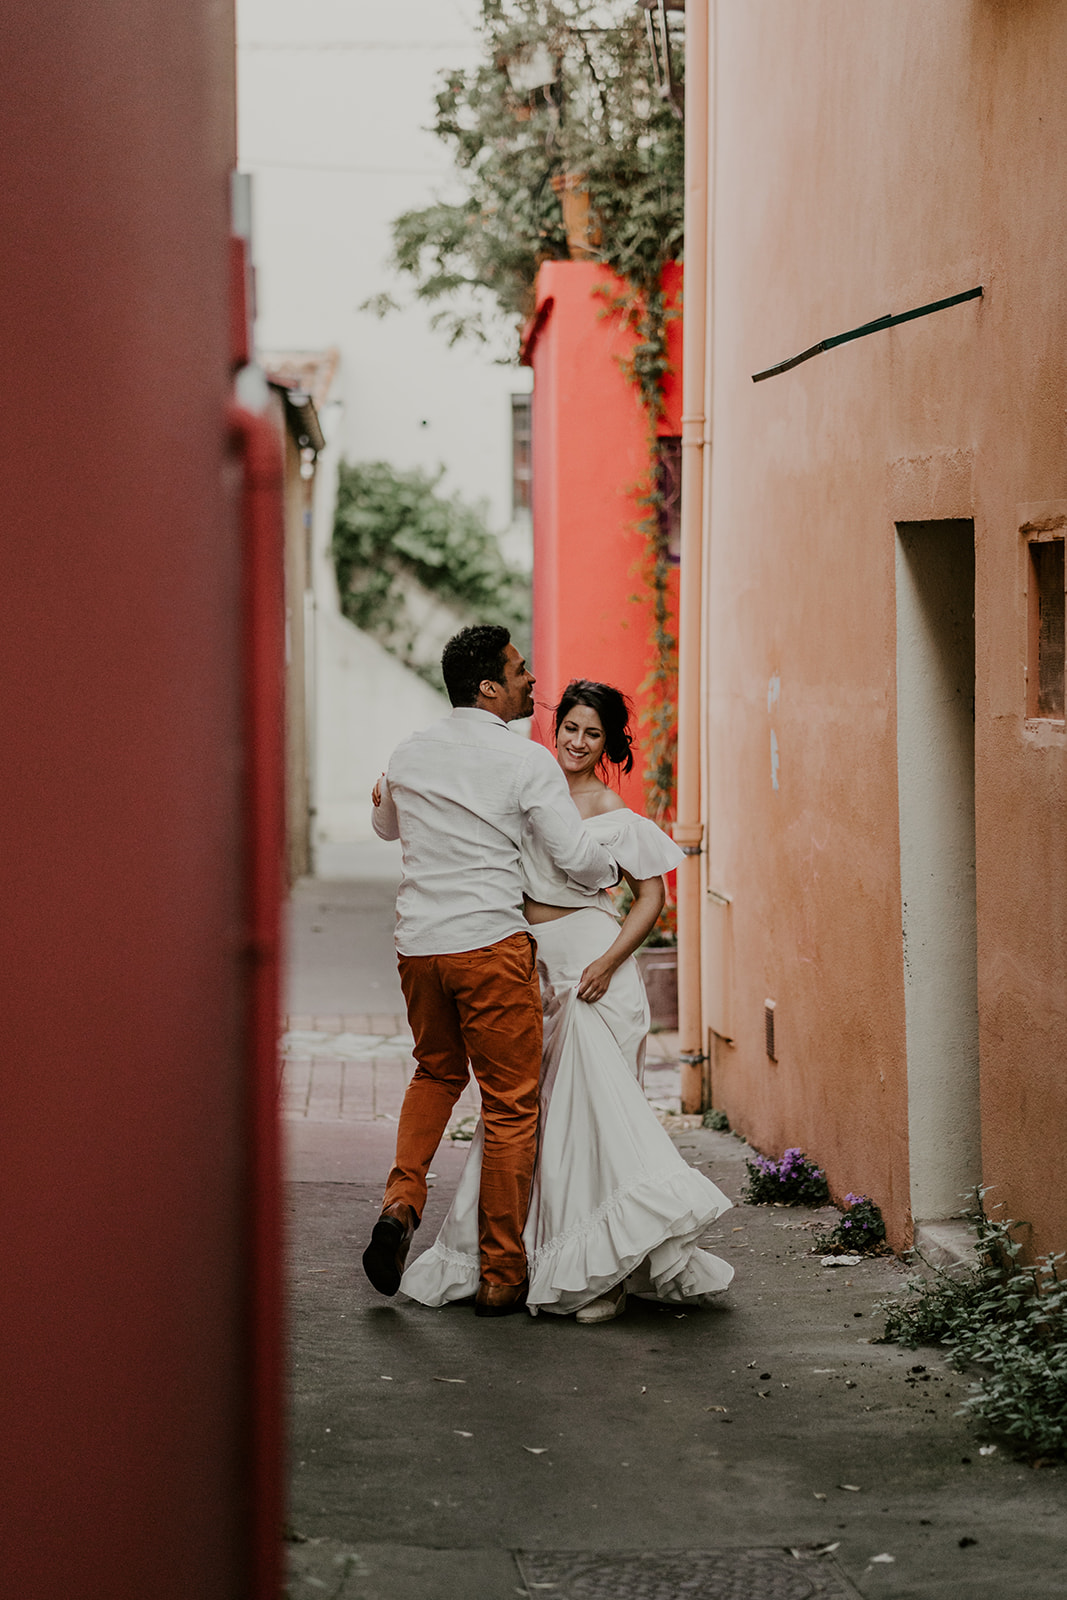 robe de mariee blanche espagnole photo mariage danse